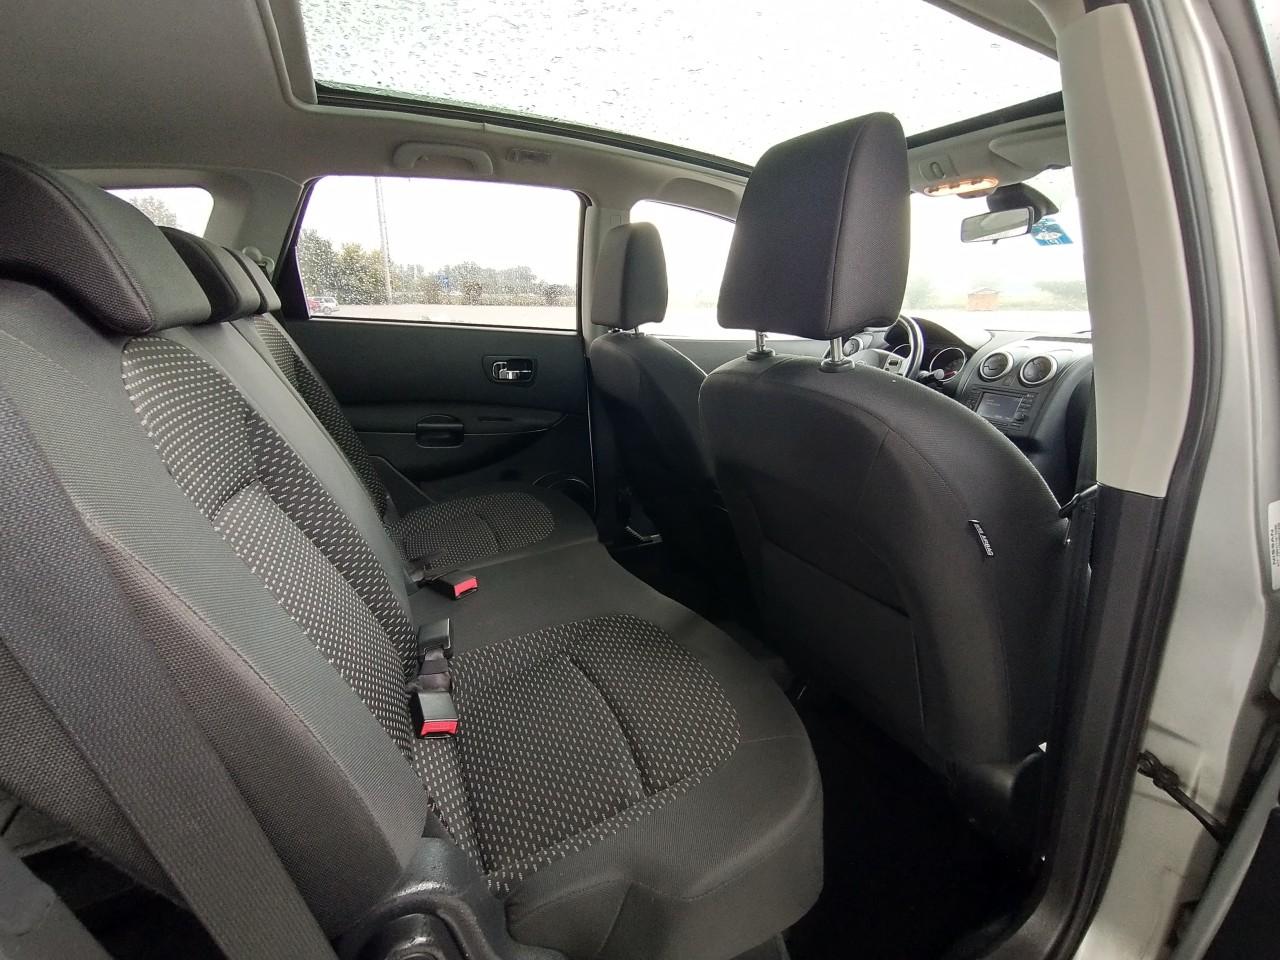 Nissan Qashqai+2 2.0 Diesel 150 CP 7Locuri Panorama Camera Carlig Jante - Full 2009